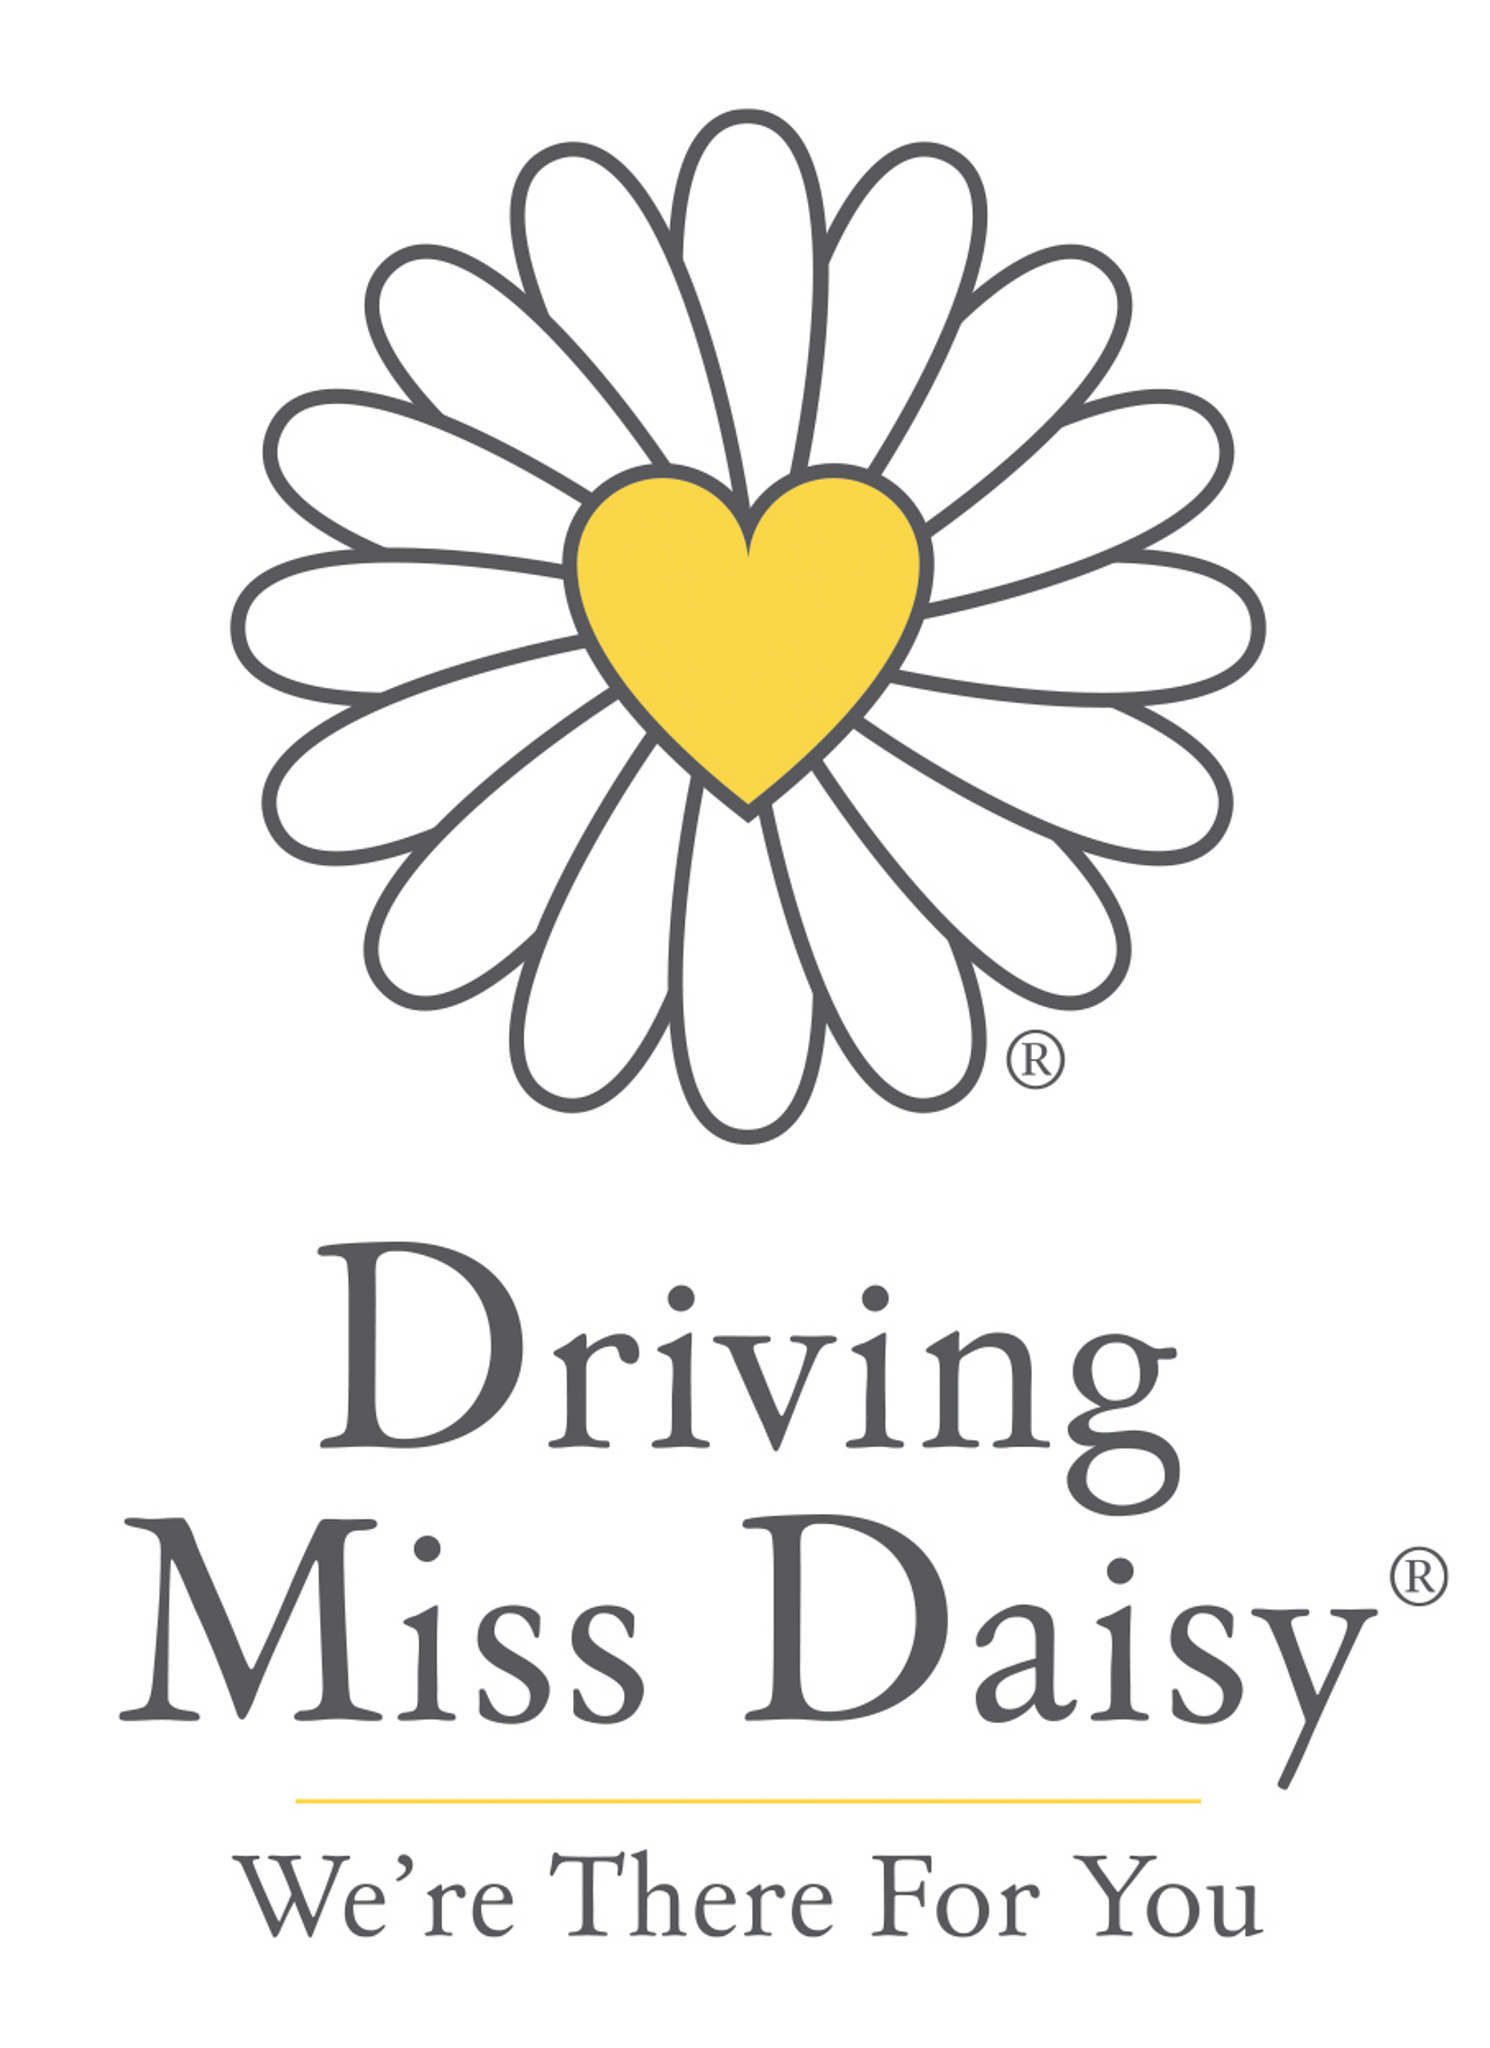 Driving Miss Daisy Logo